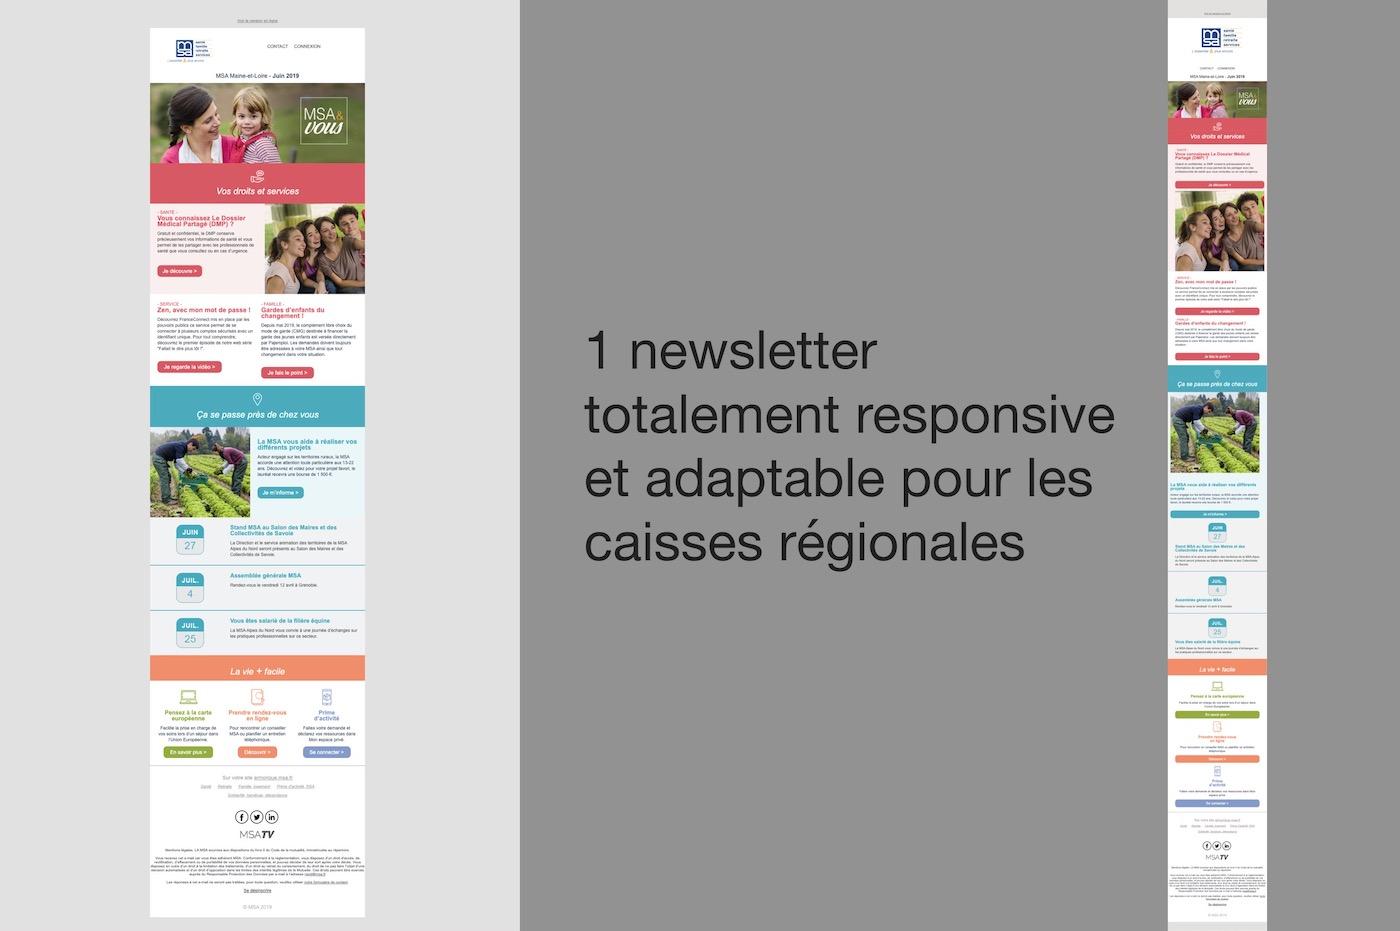 newsletter msa illustration